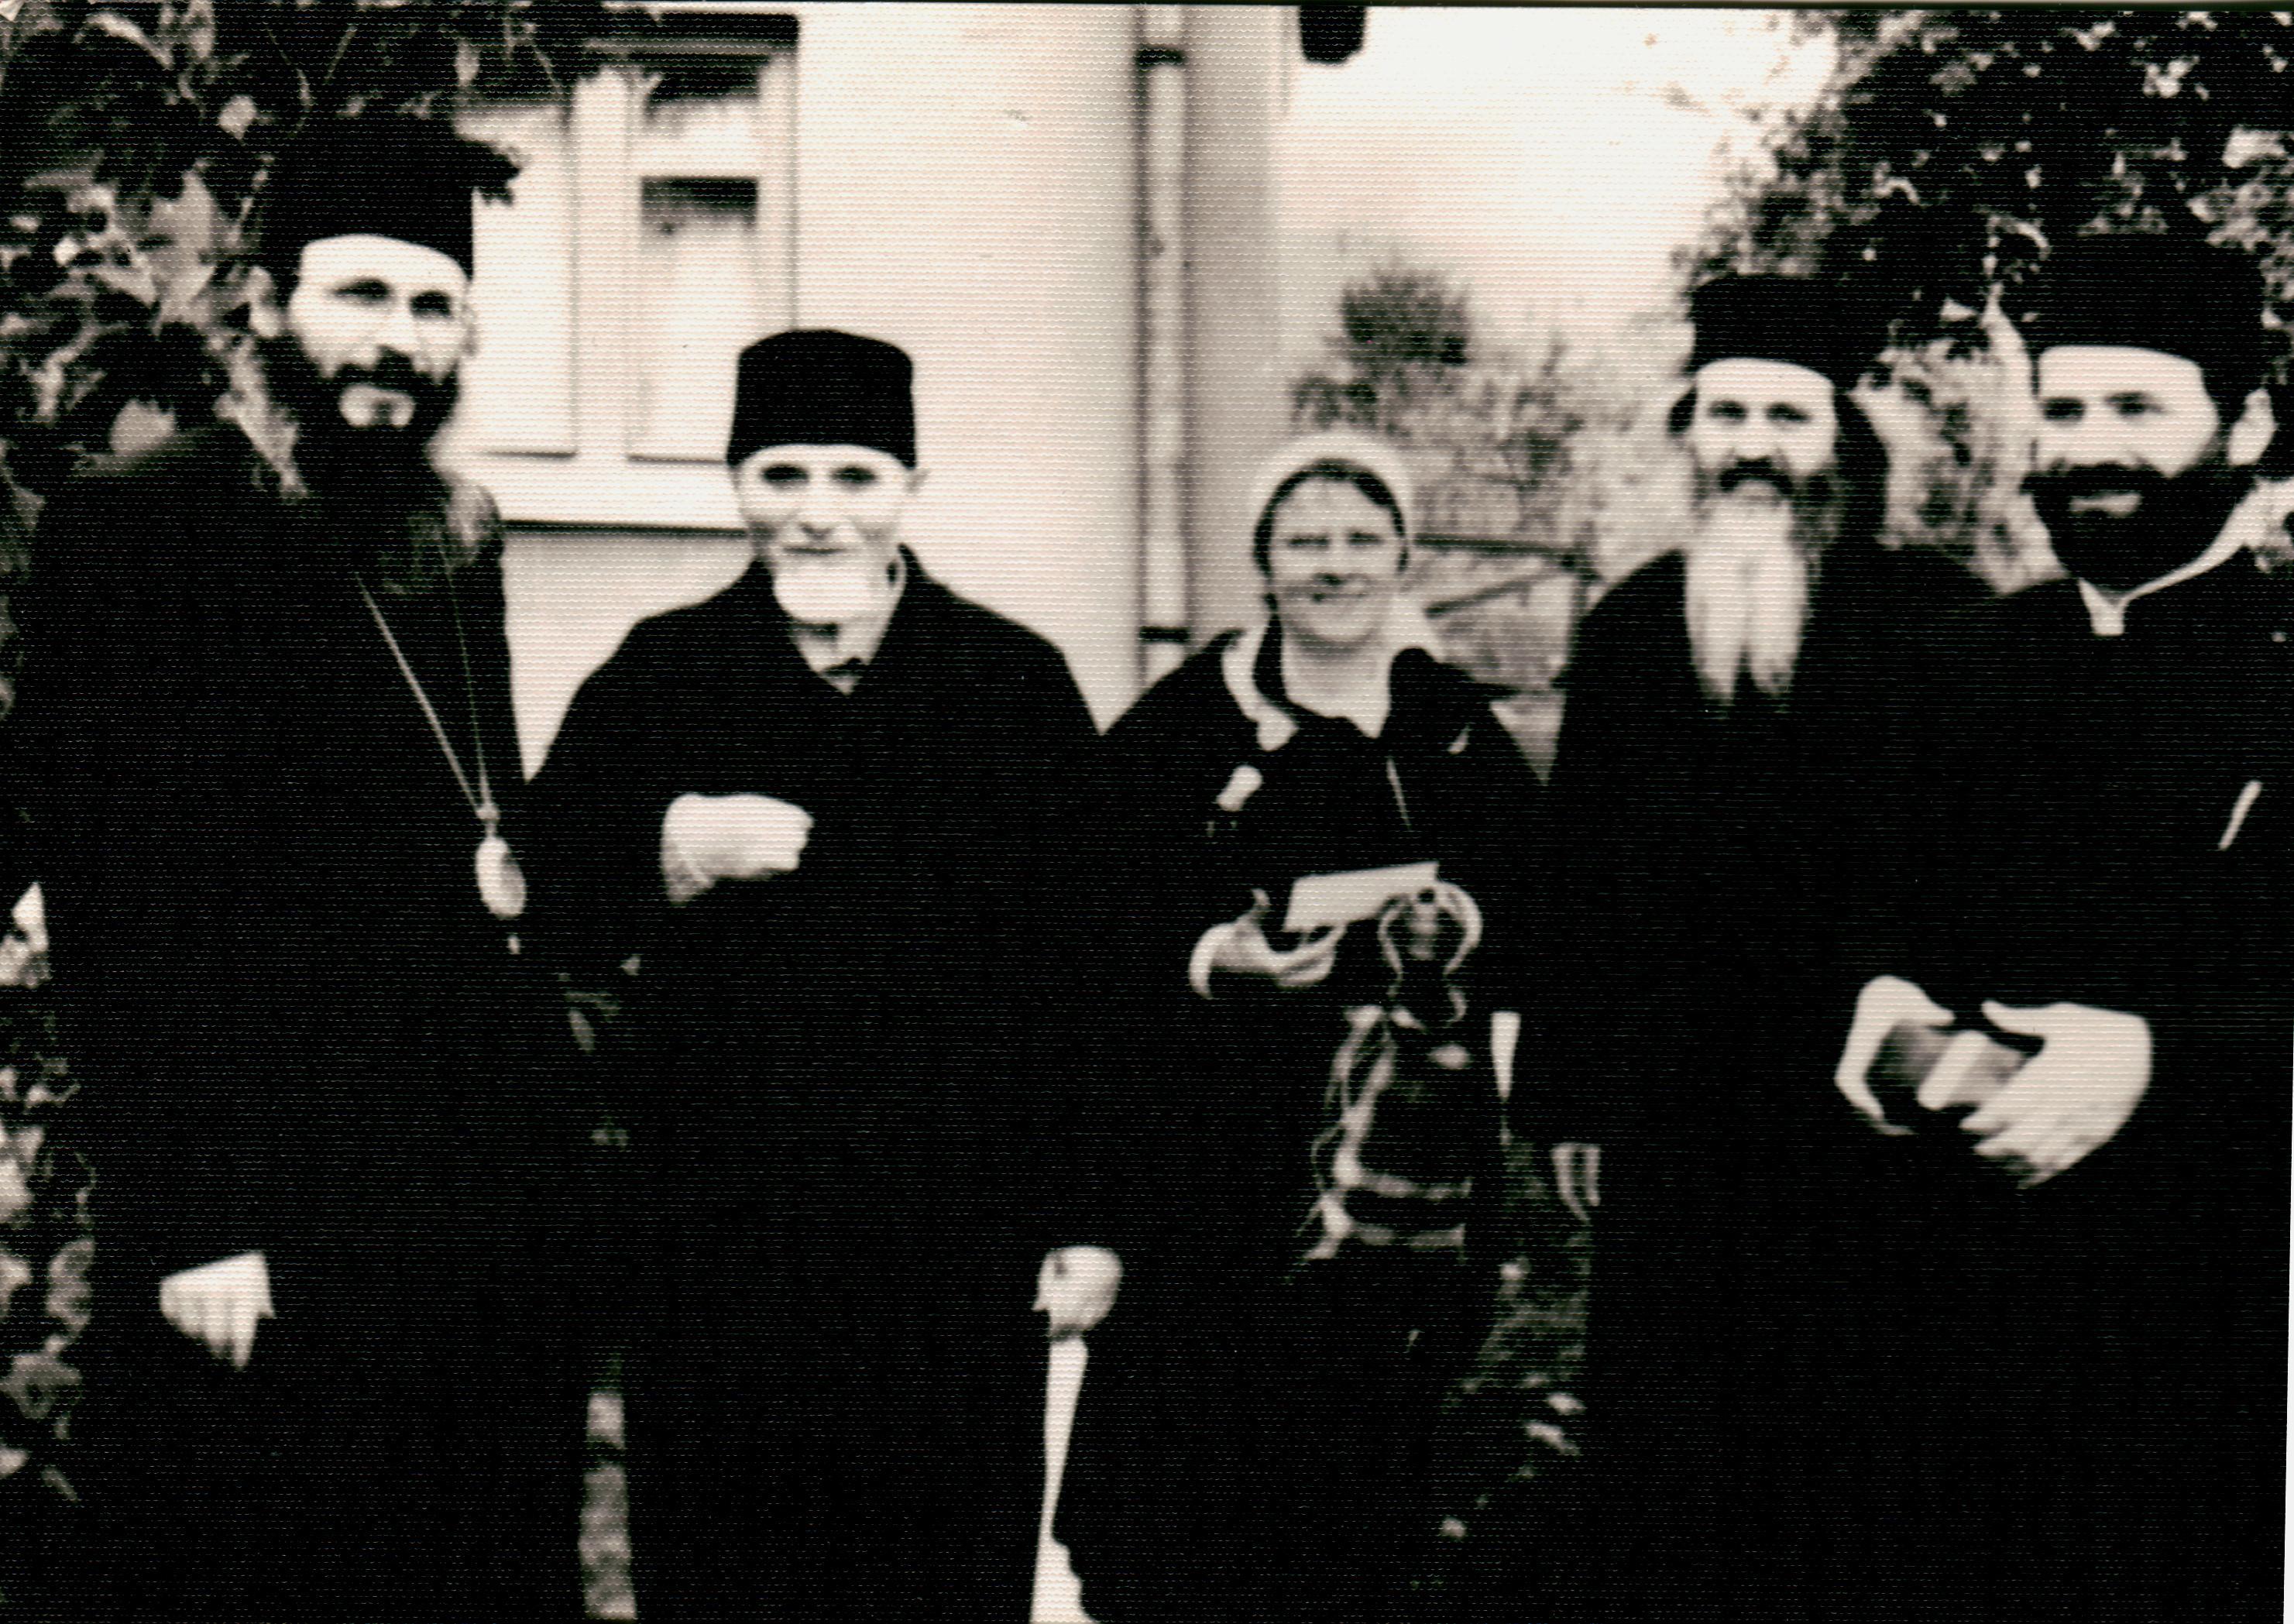 Parintele Dimitrie Bejan si alti preoti